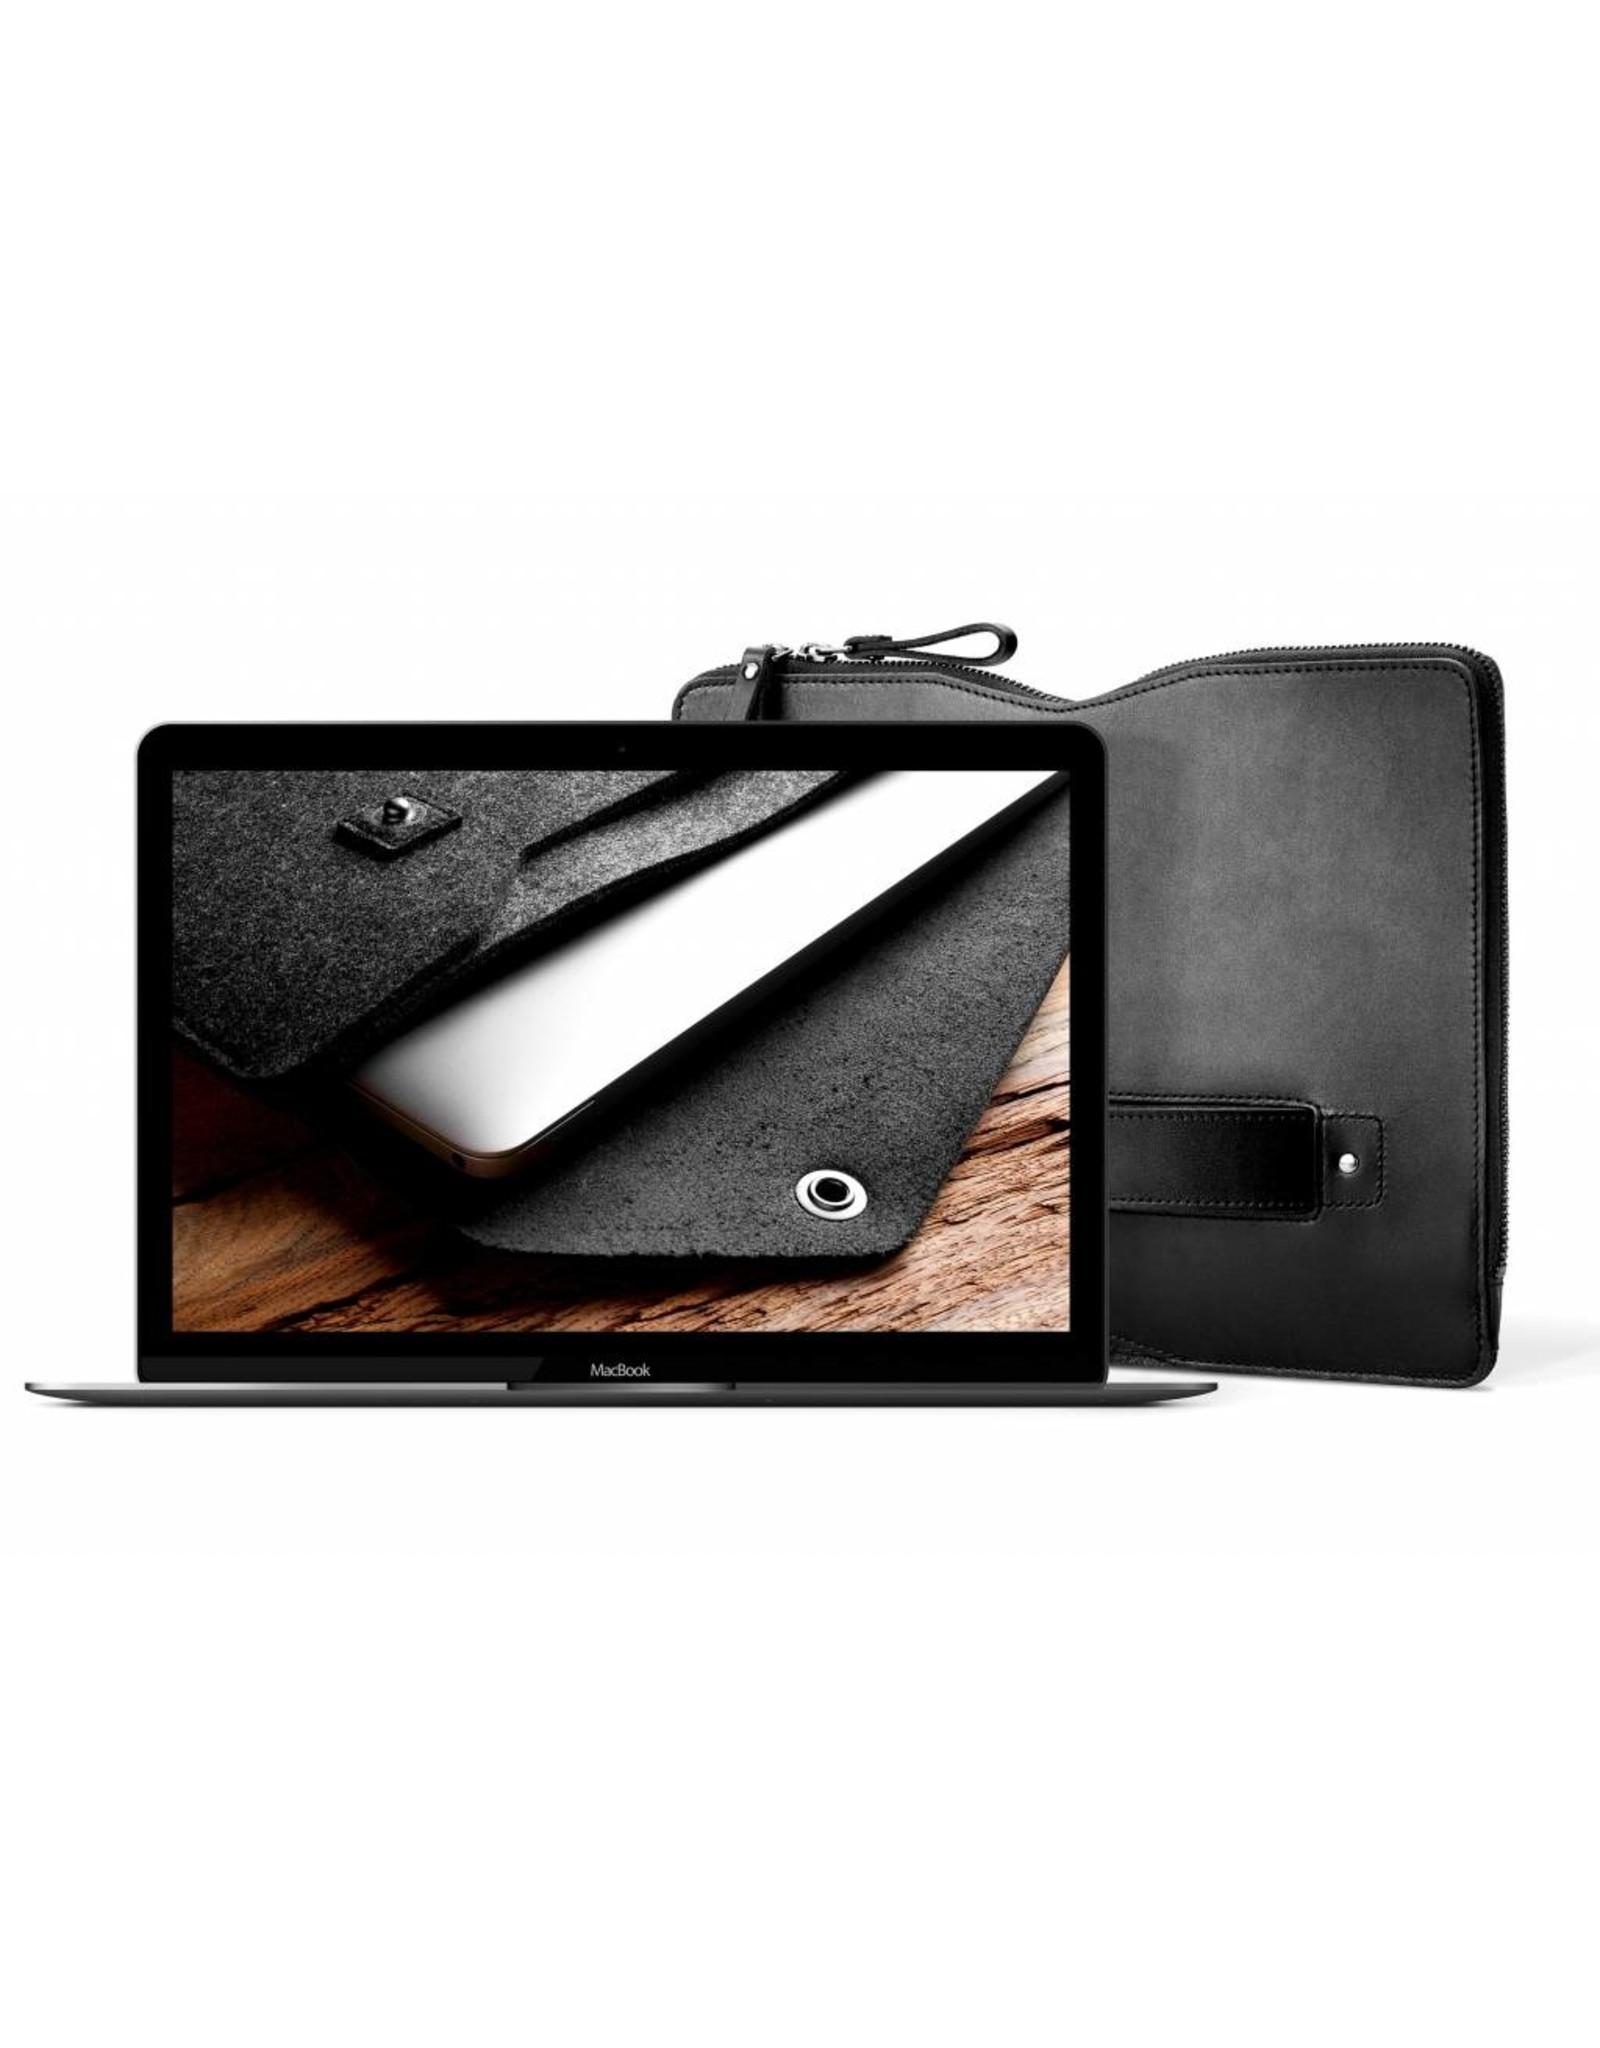 "Mujjo Mujjo 13"" MacBook Pro Folio Sleeve - Black"